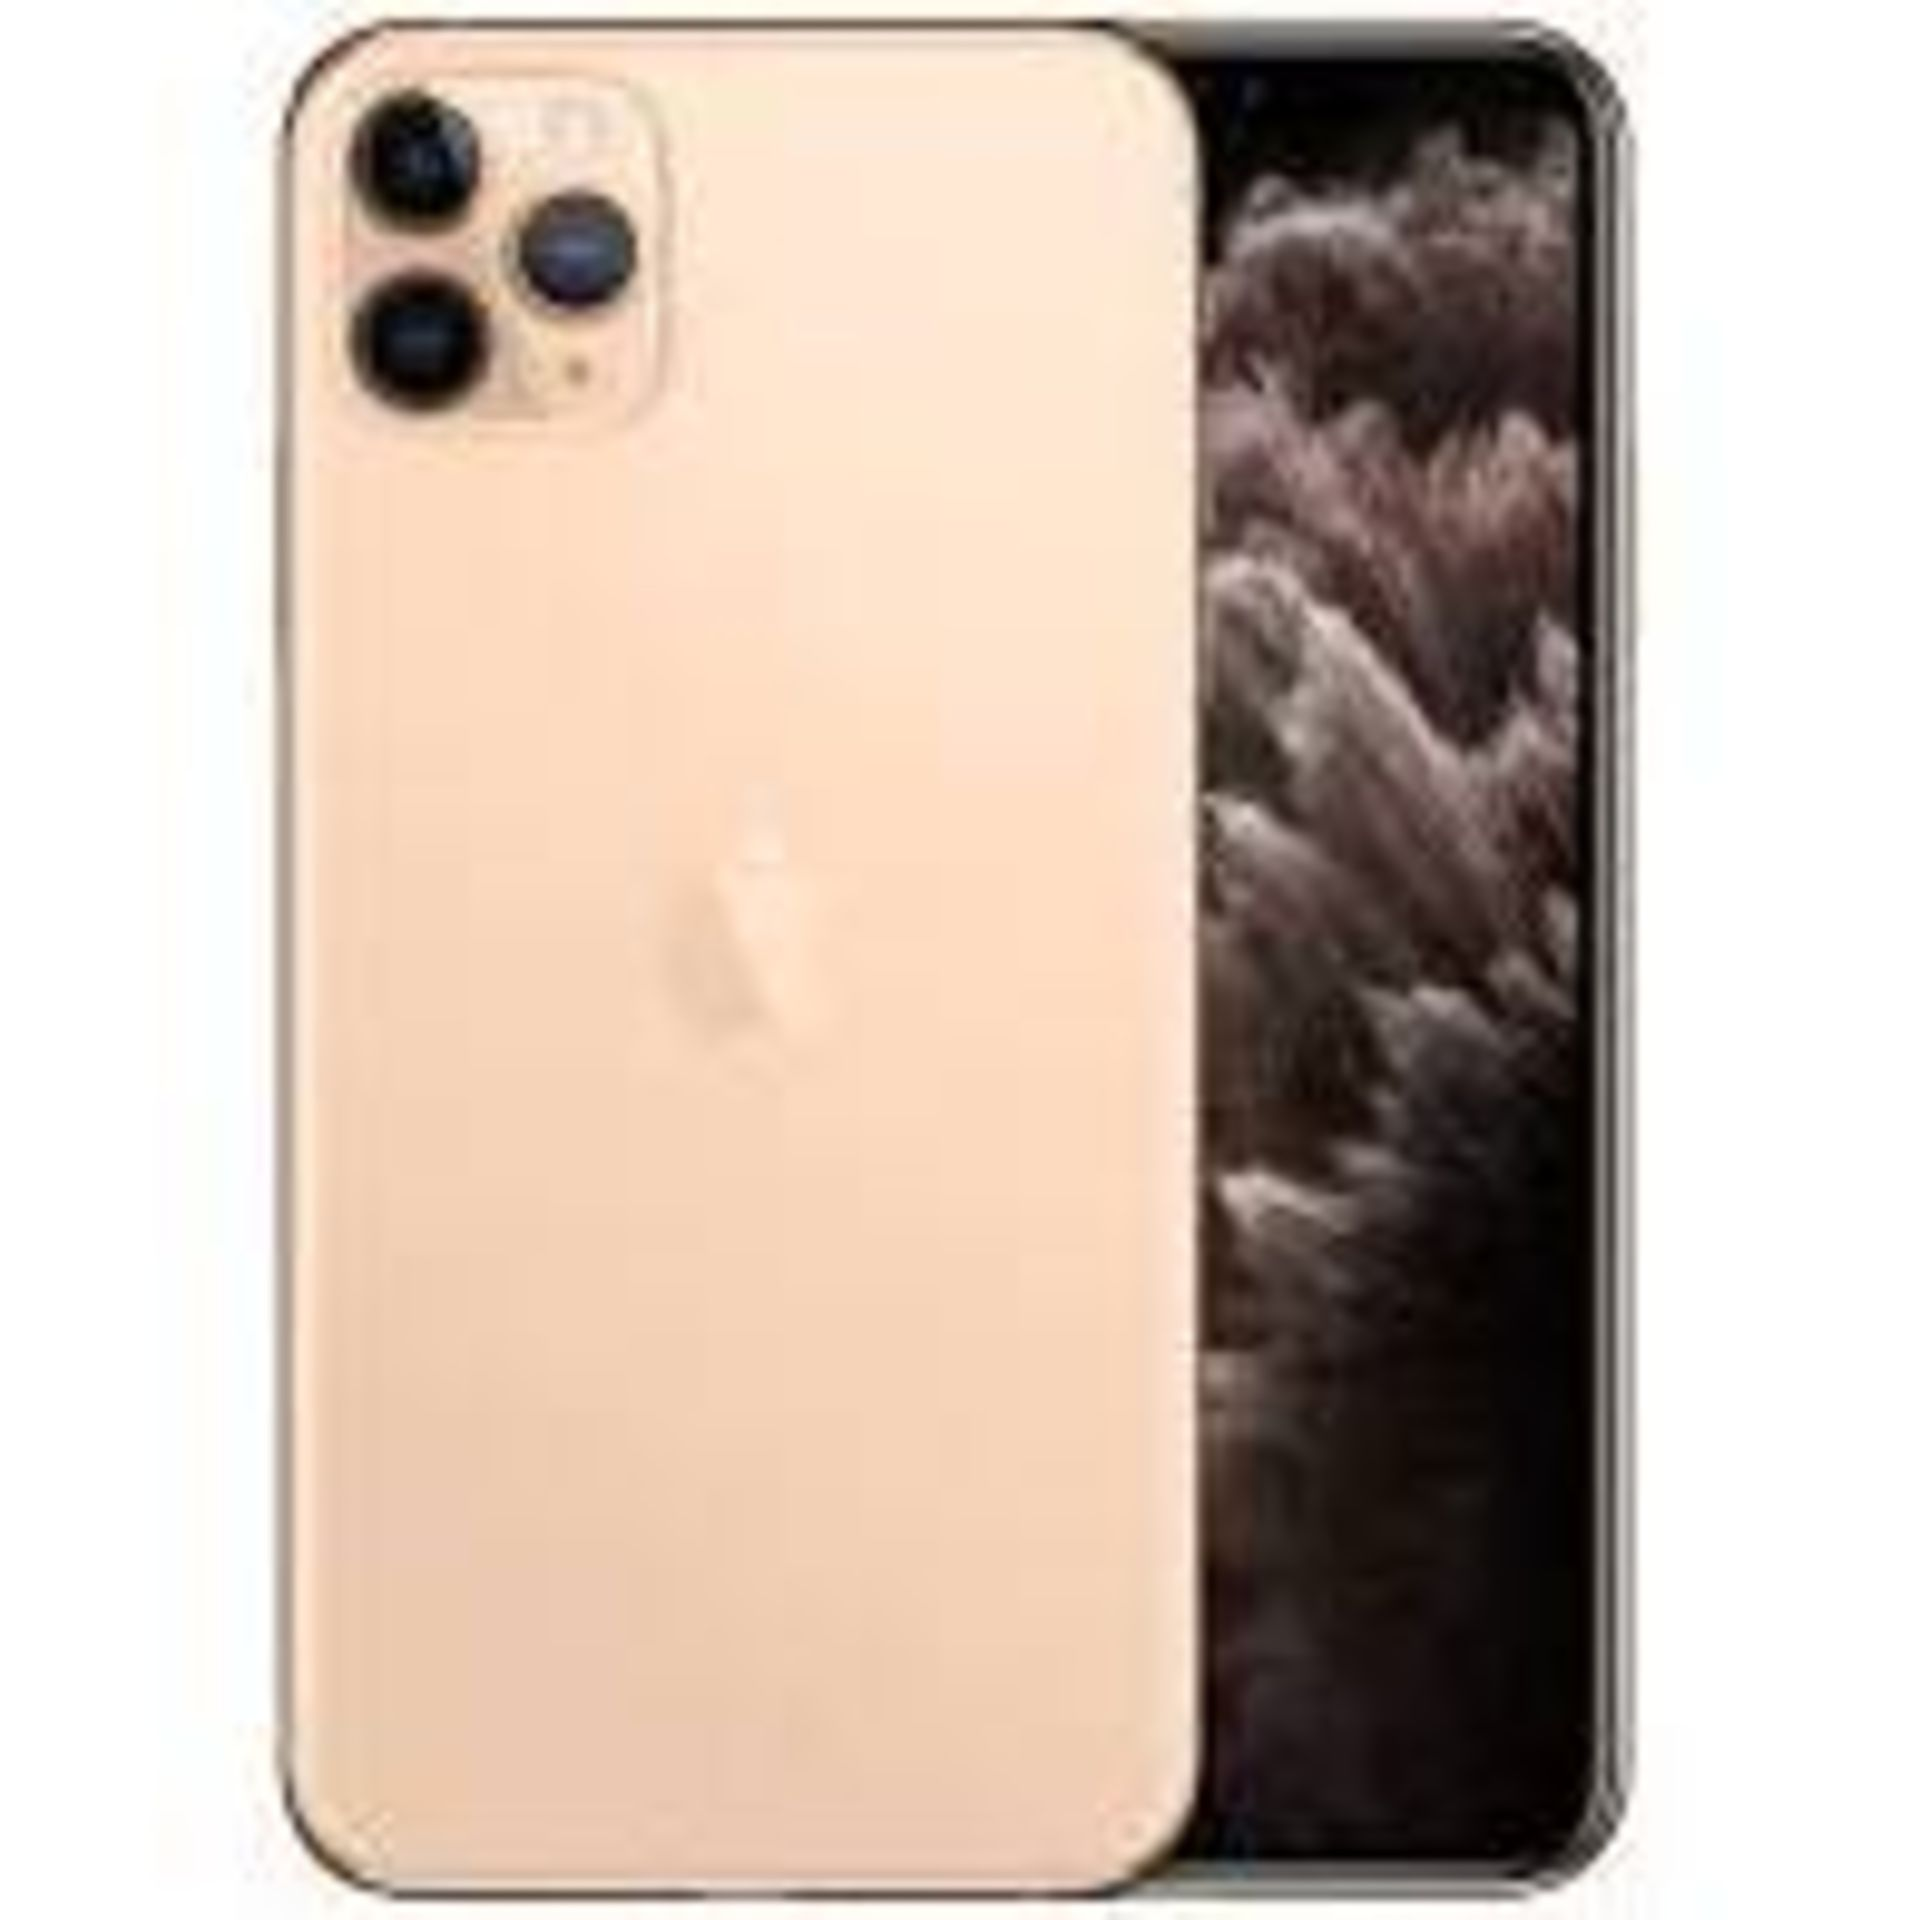 RRP £1,149 Apple iPhone 11 Pro Max 64GB Gold